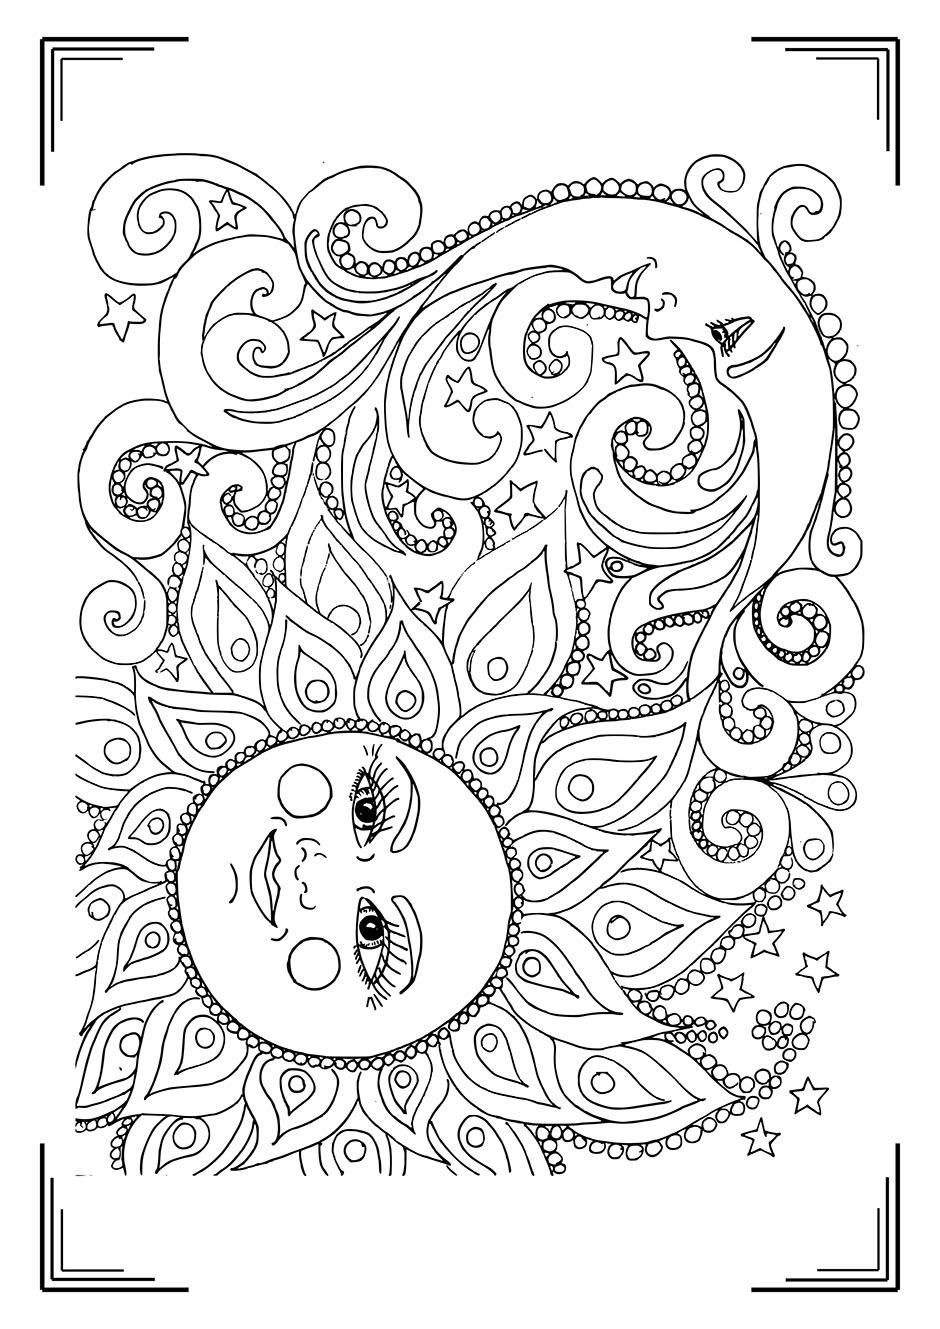 Раскраска: солнце и луна — raskraski-a4.ru